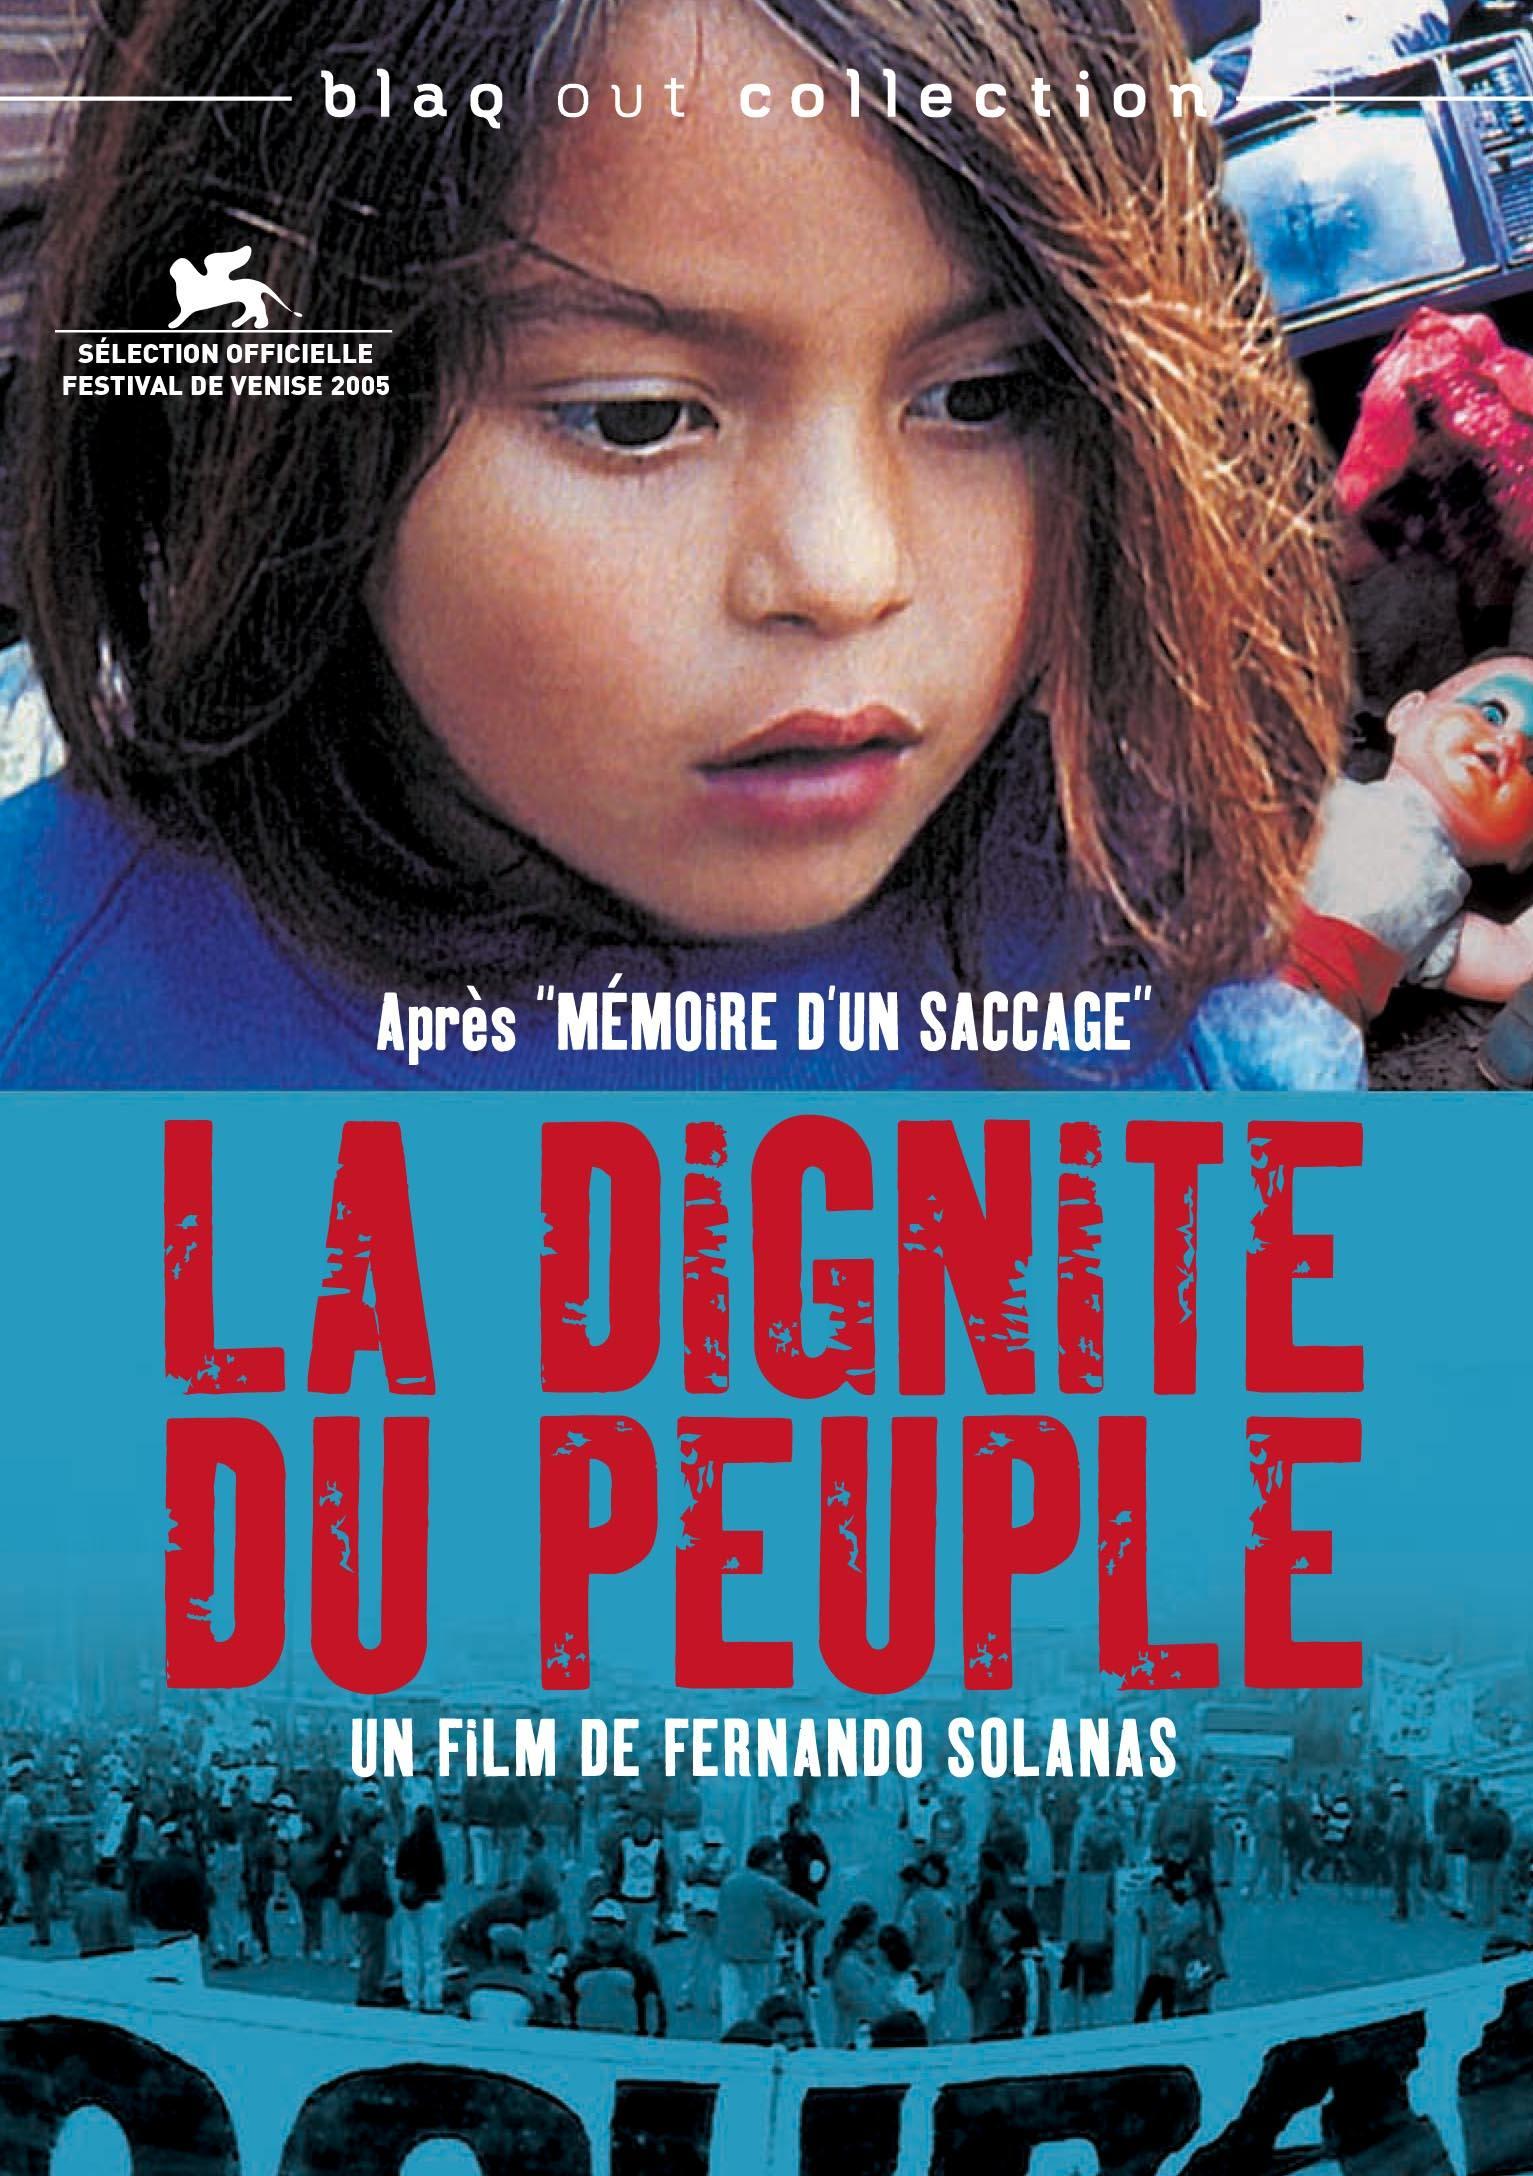 Argentine. dignite du peuple - dvd